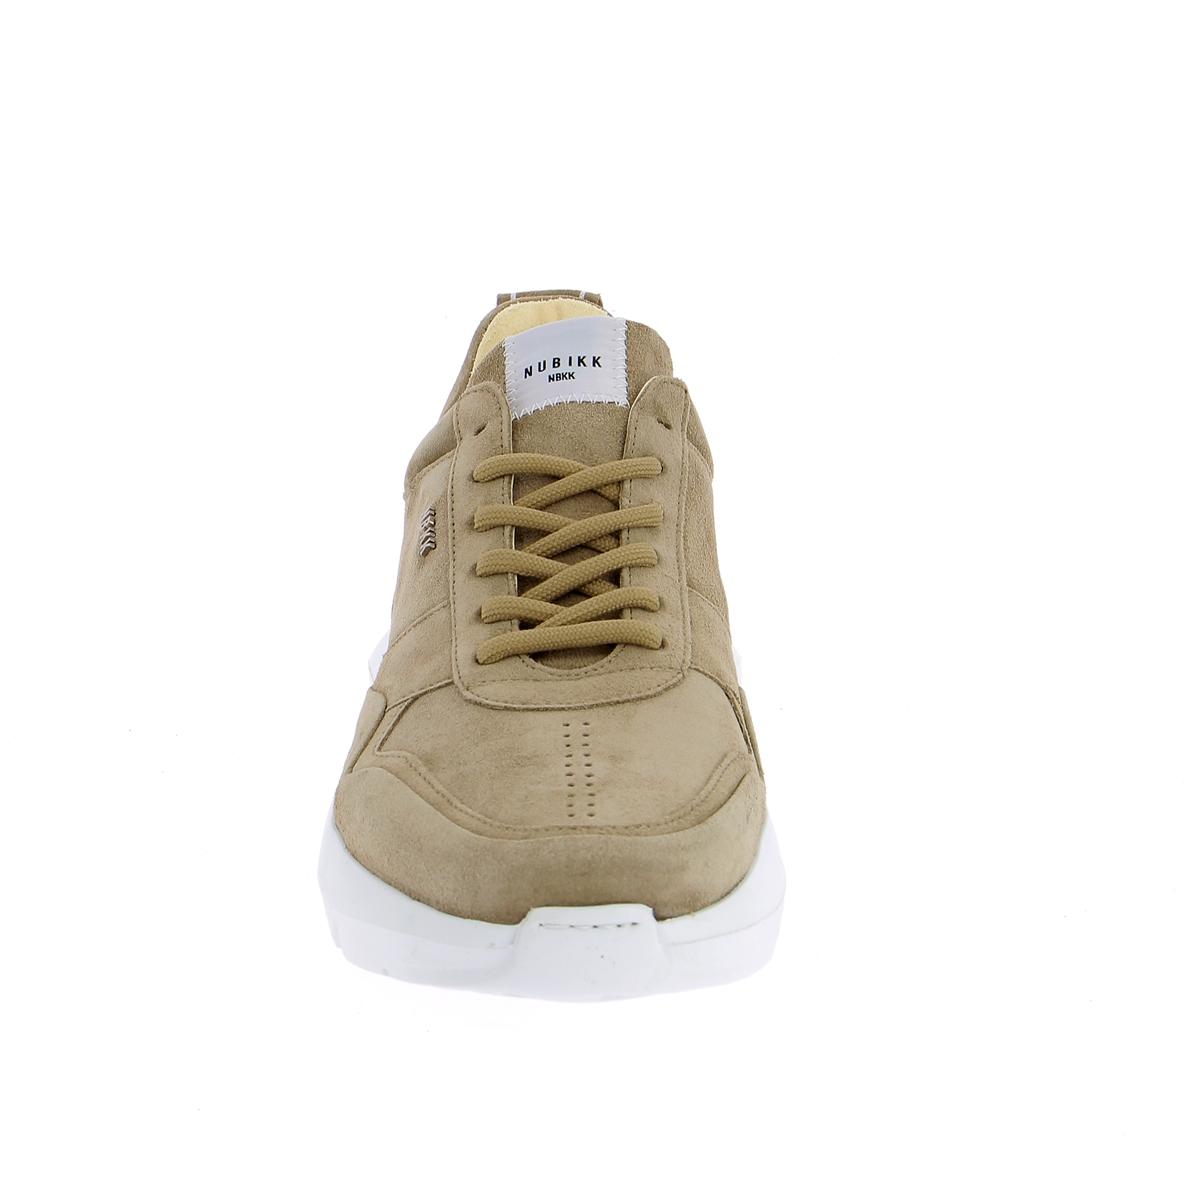 Nubikk Sneakers beige